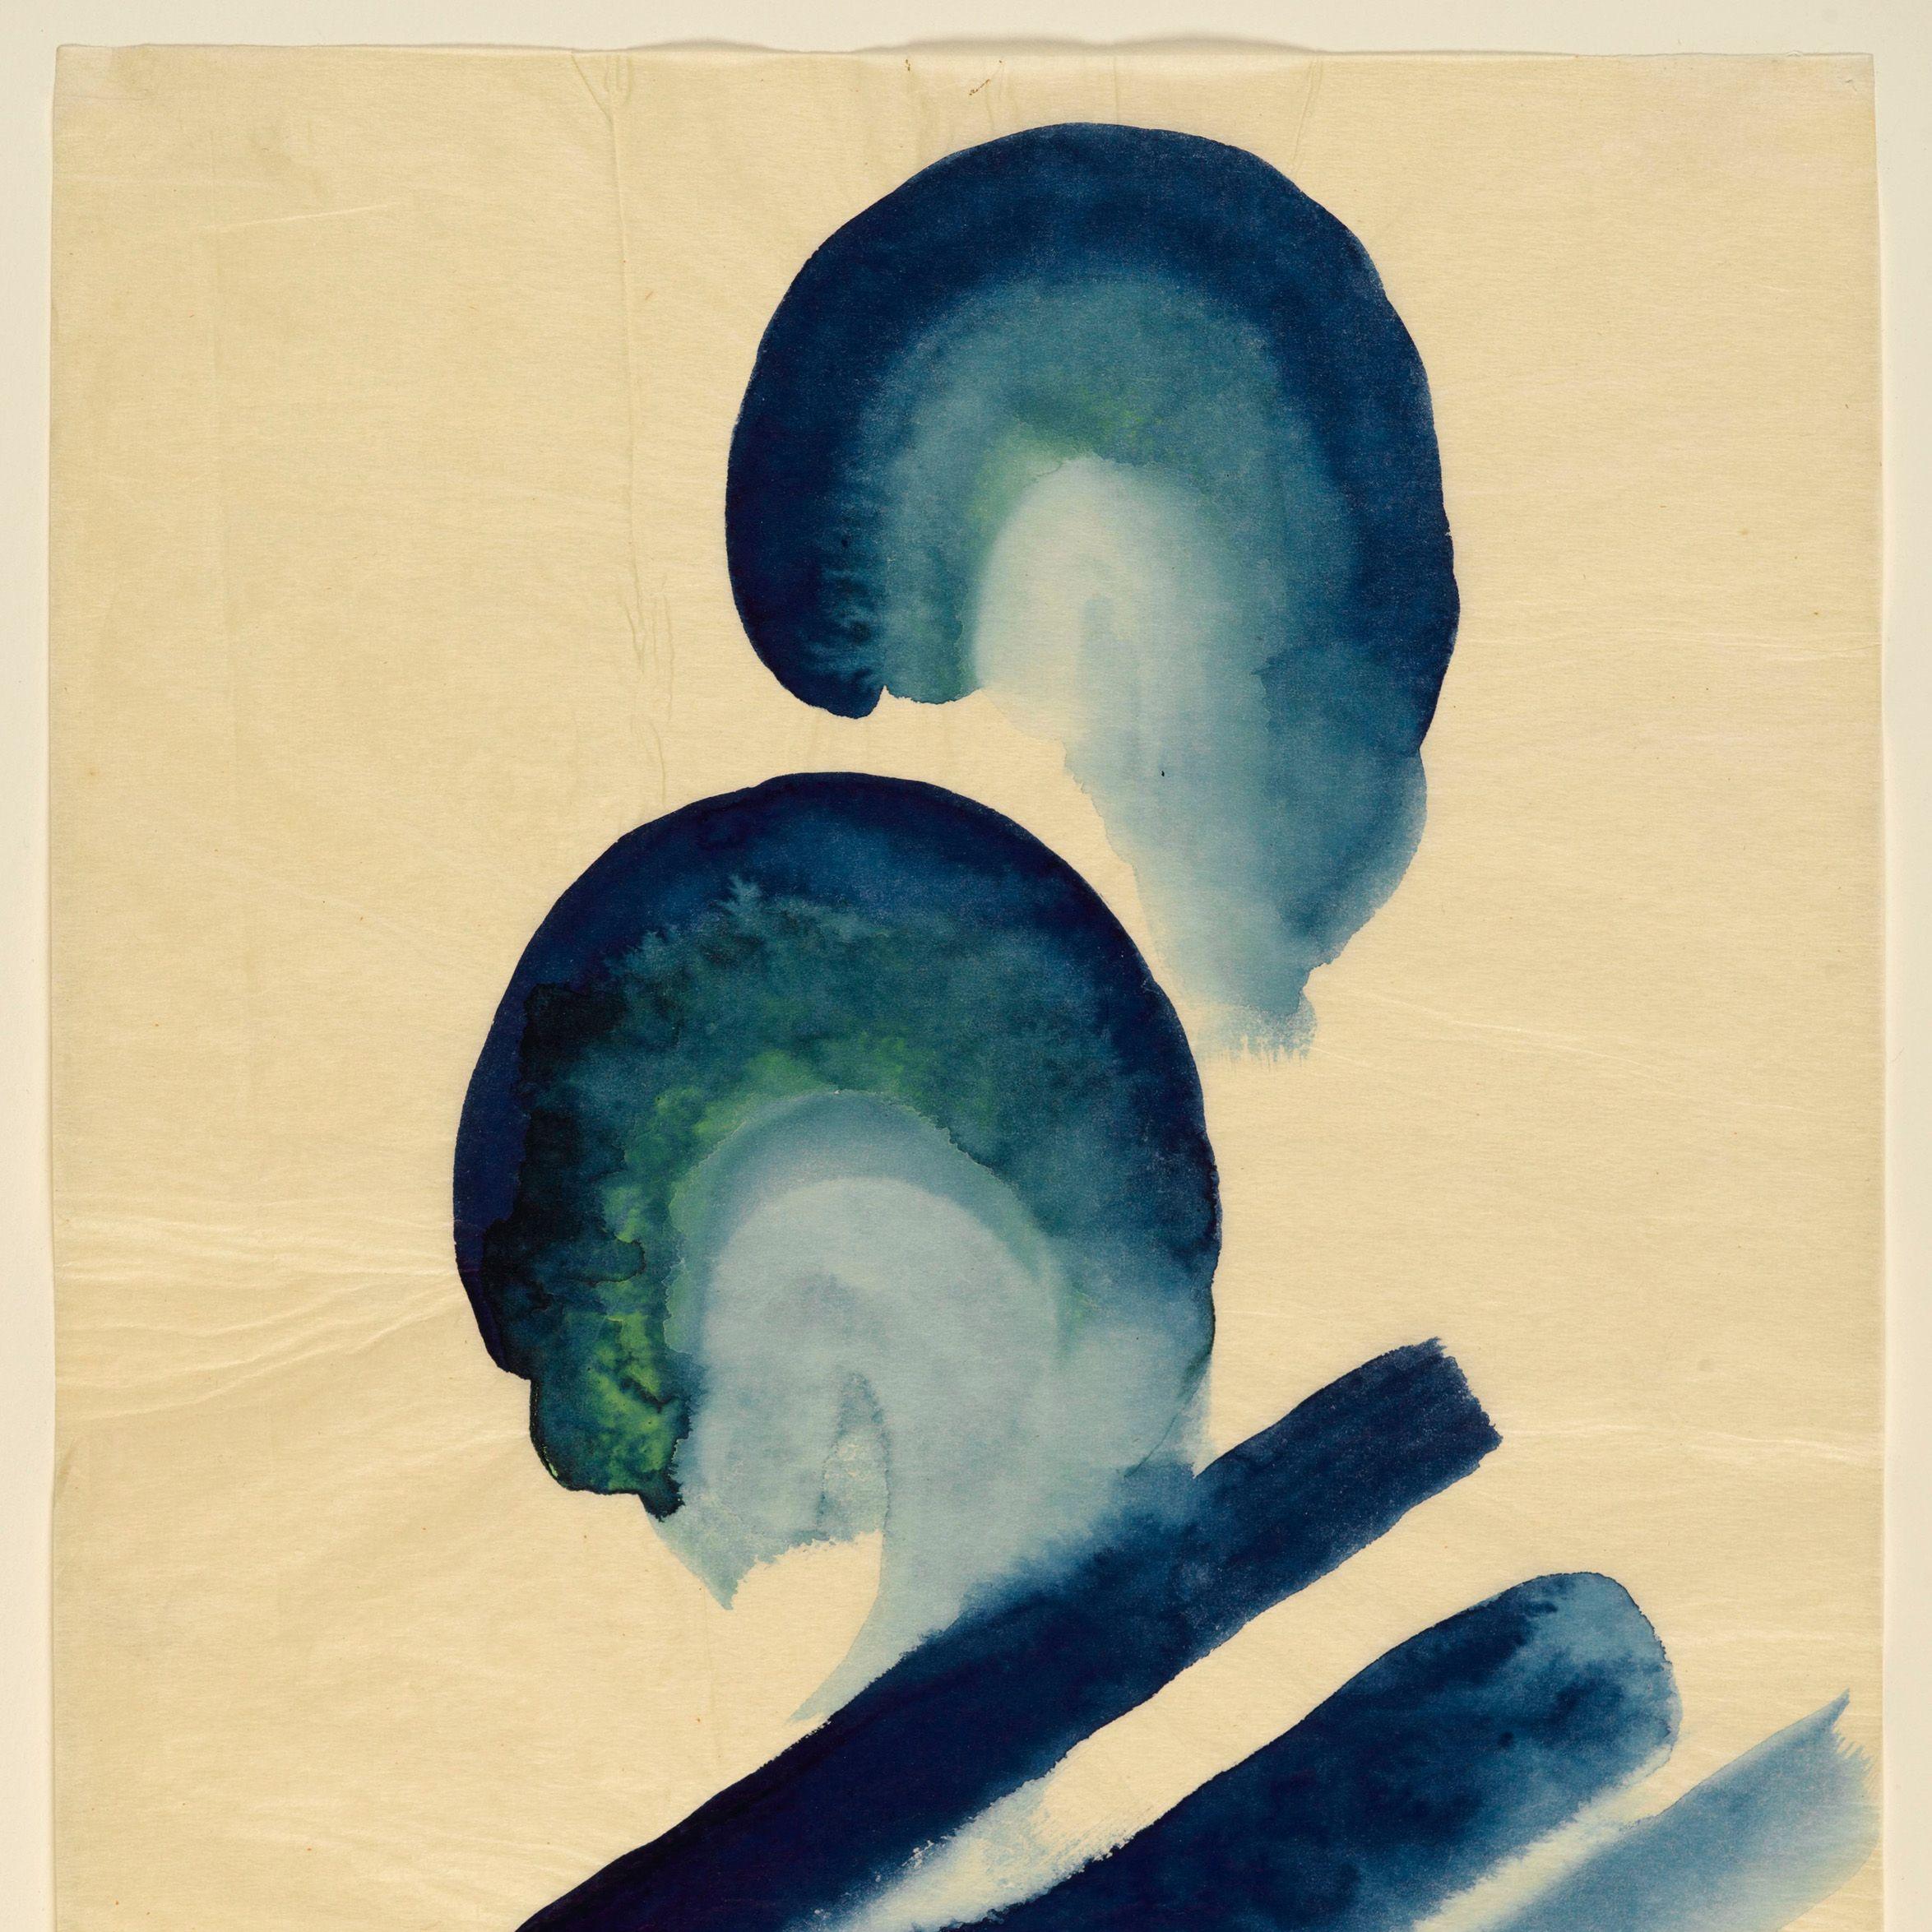 "<p>Georgia O'Keeffe (American 1887-1986).<em data-redactor-tag=""em"" data-verified=""redactor""> Blue #2</em>, 1916. Watercolor on paper, 15 7/8 x 11 in. (40.3 x 27.8 cm). Brooklyn Museum&#x3B; Bequest of Mary T. Cockcroft, by exchange, 58.74. ( Photo: Sarah DeSantis, Brooklyn Museum)&nbsp&#x3B;</p>"